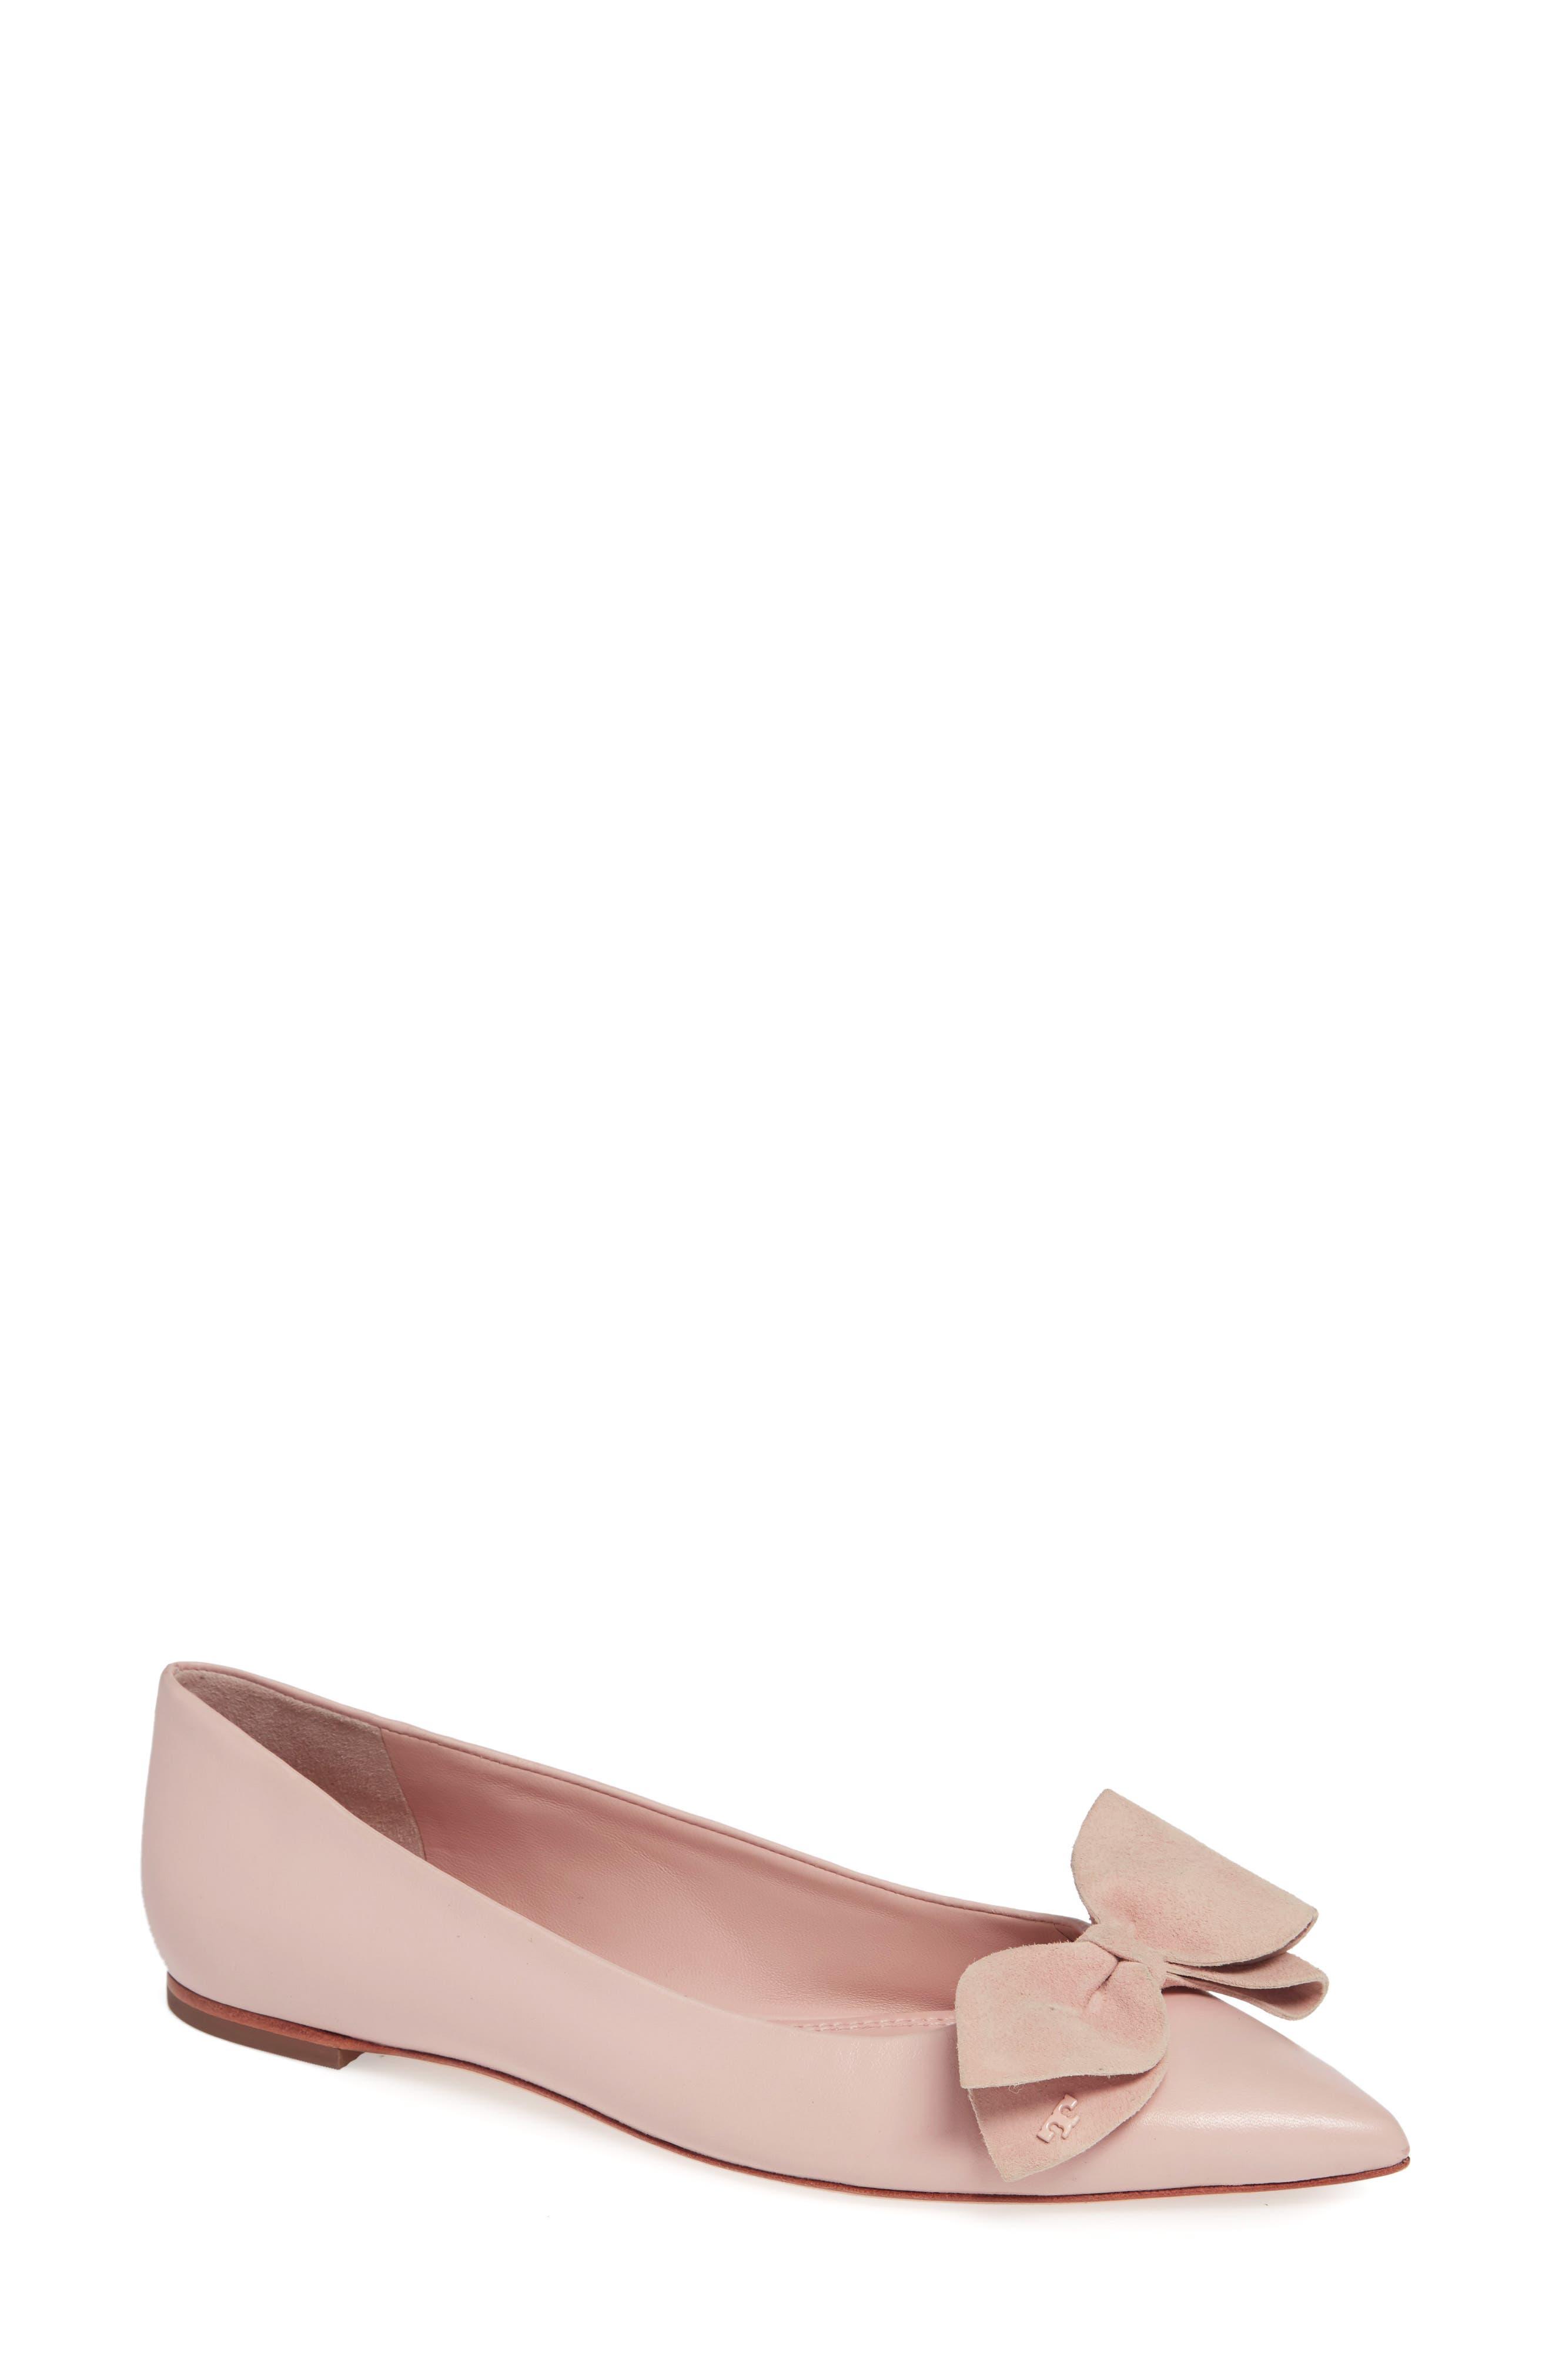 Rosalind Bow Pointy Toe Flat,                         Main,                         color, Sea Shell Pink